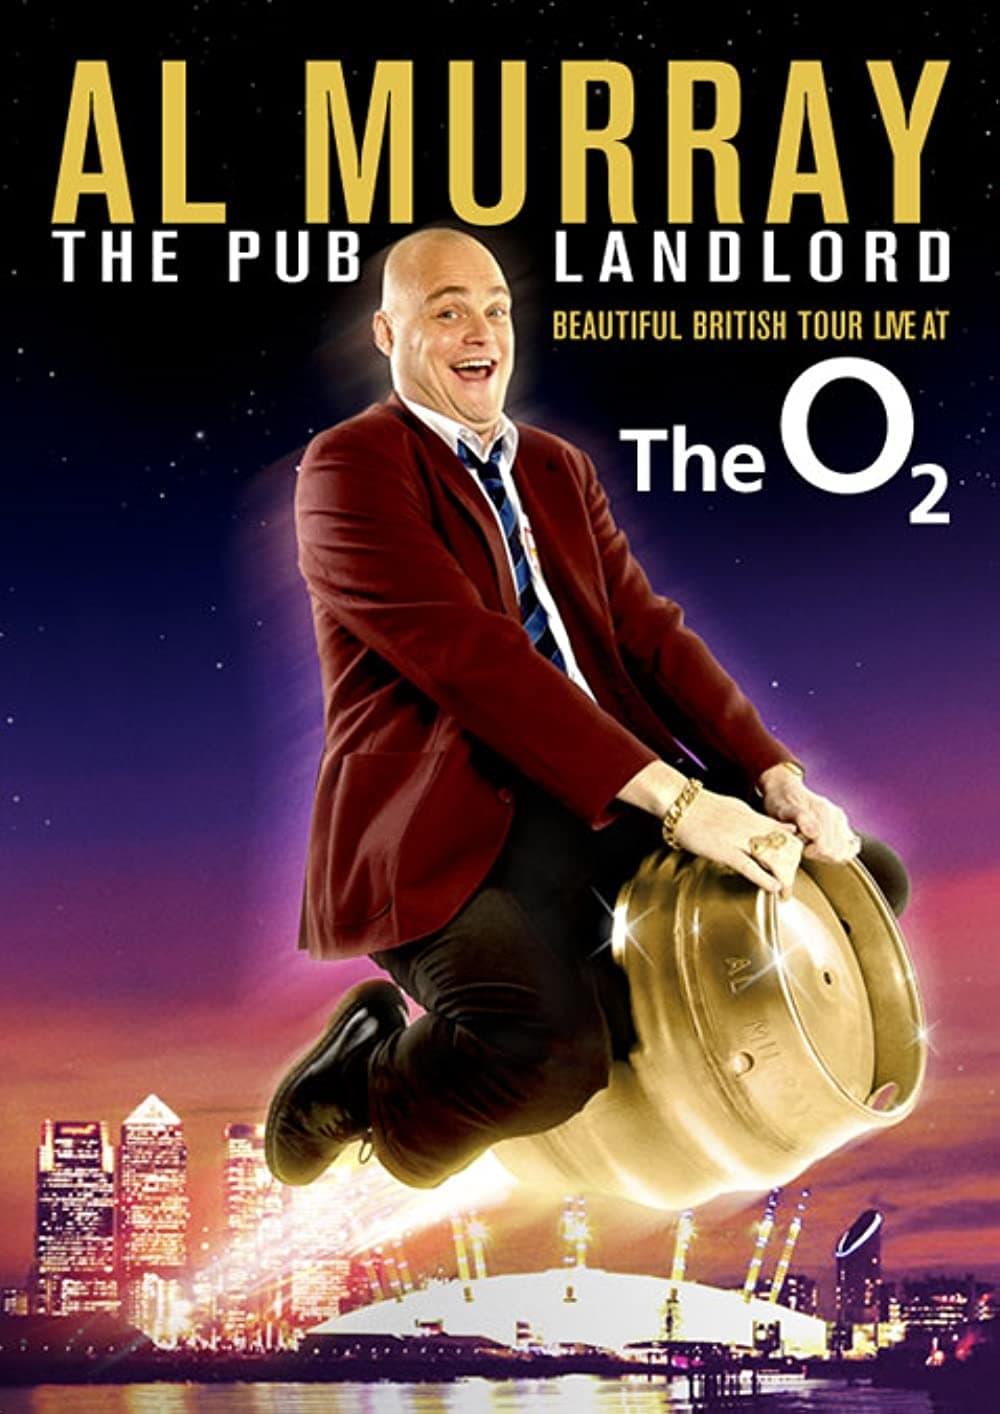 Al Murray, The Pub Landlord - Beautiful British Tour